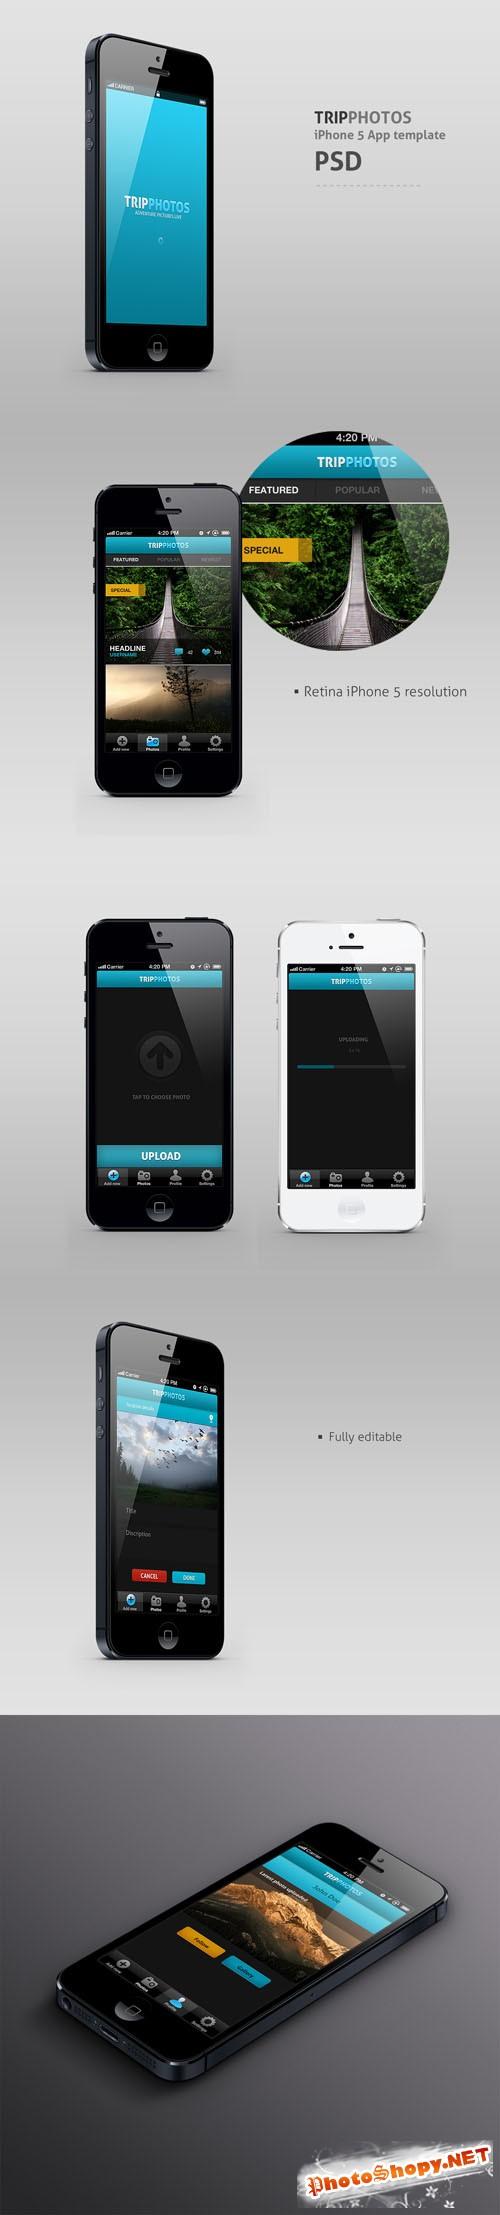 TripPhotos iPhone 5 app PSD template REUPLOAD